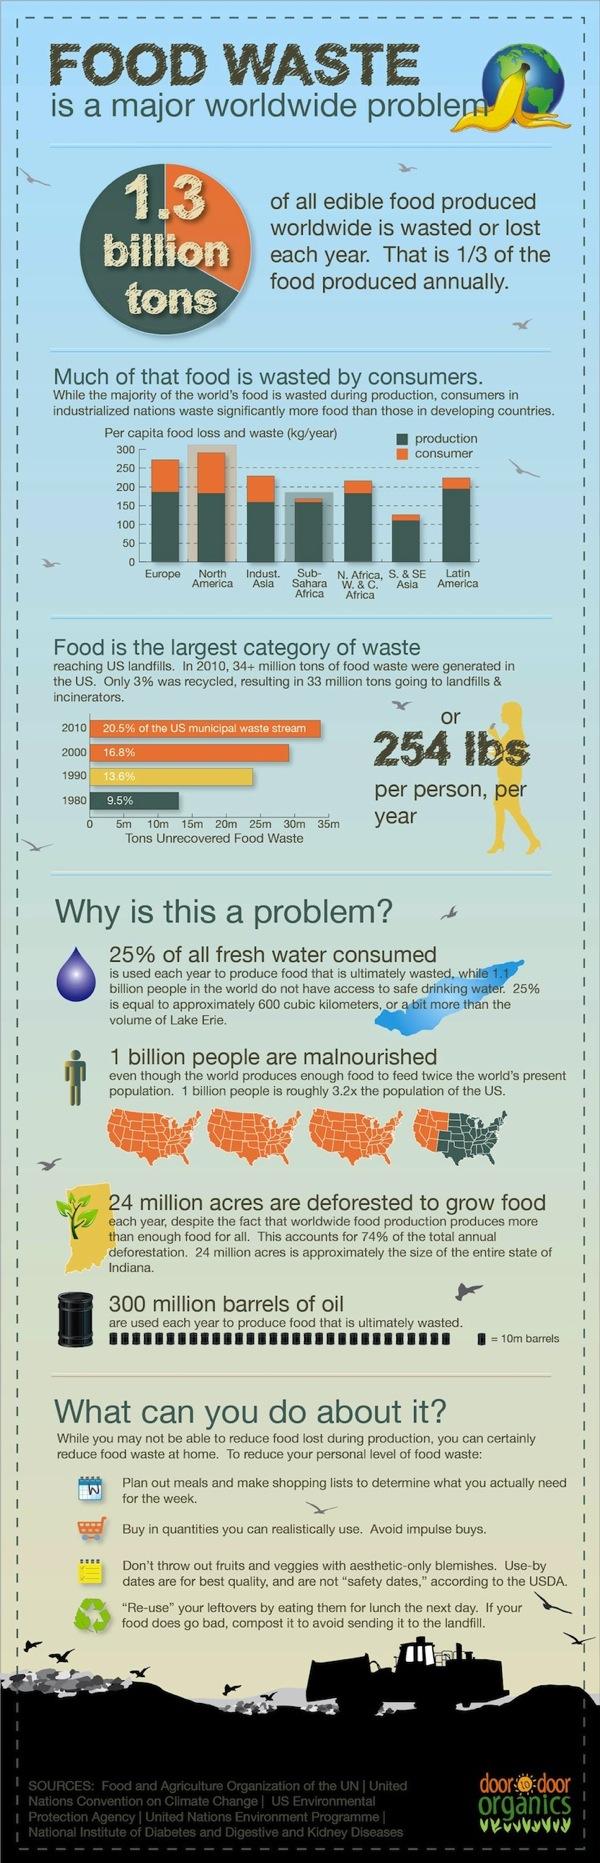 Food Waste Around the Globe